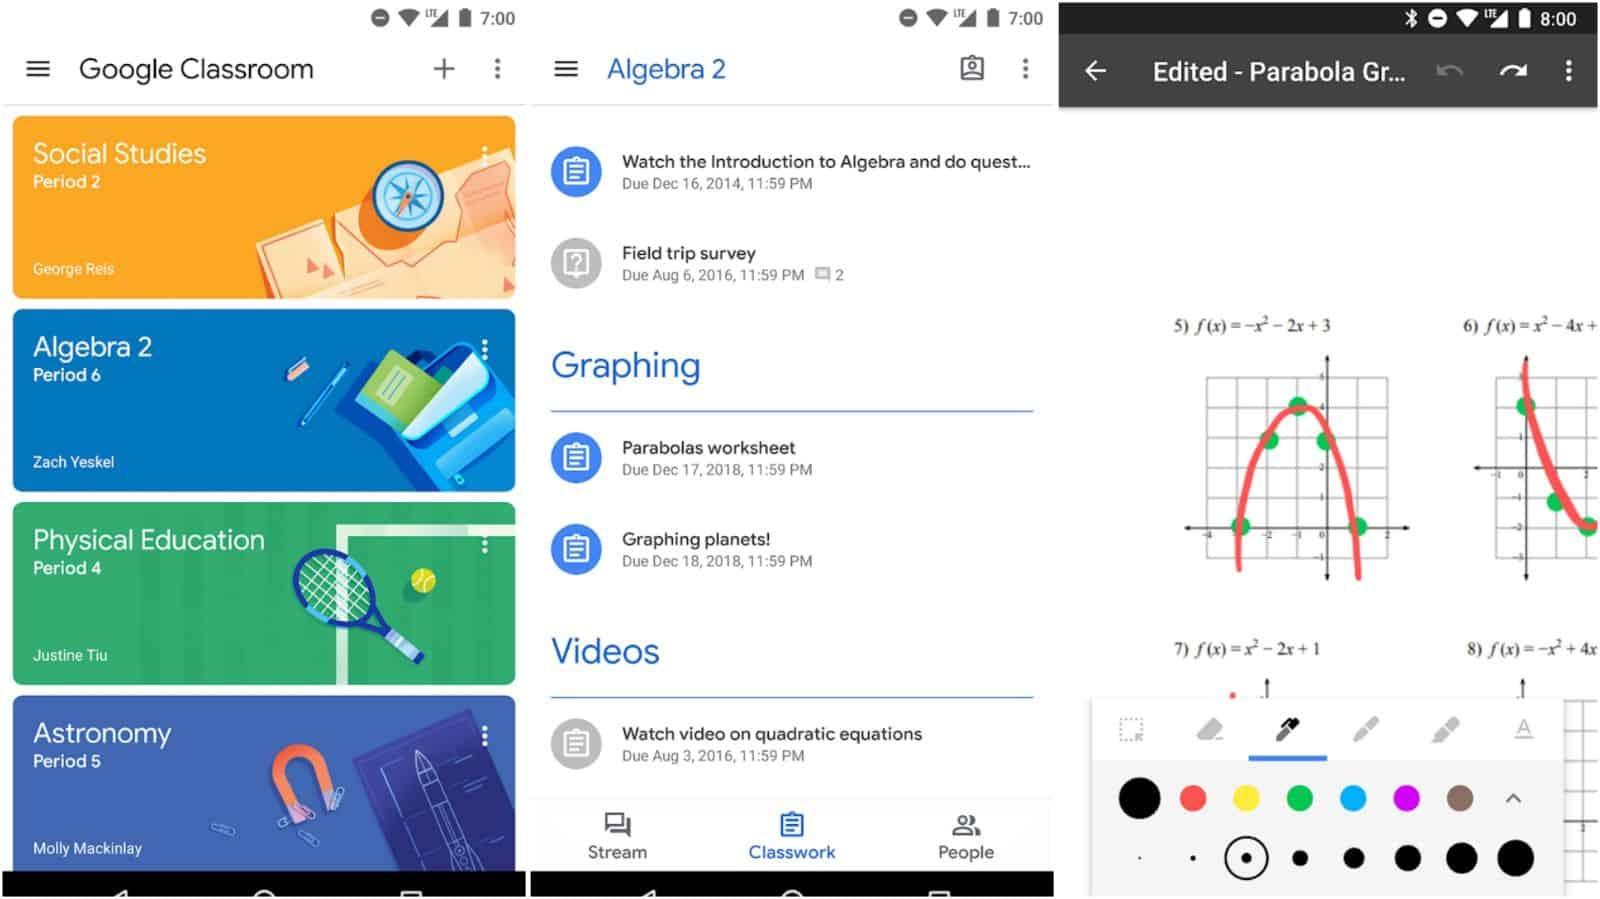 Google Classroom app grid image